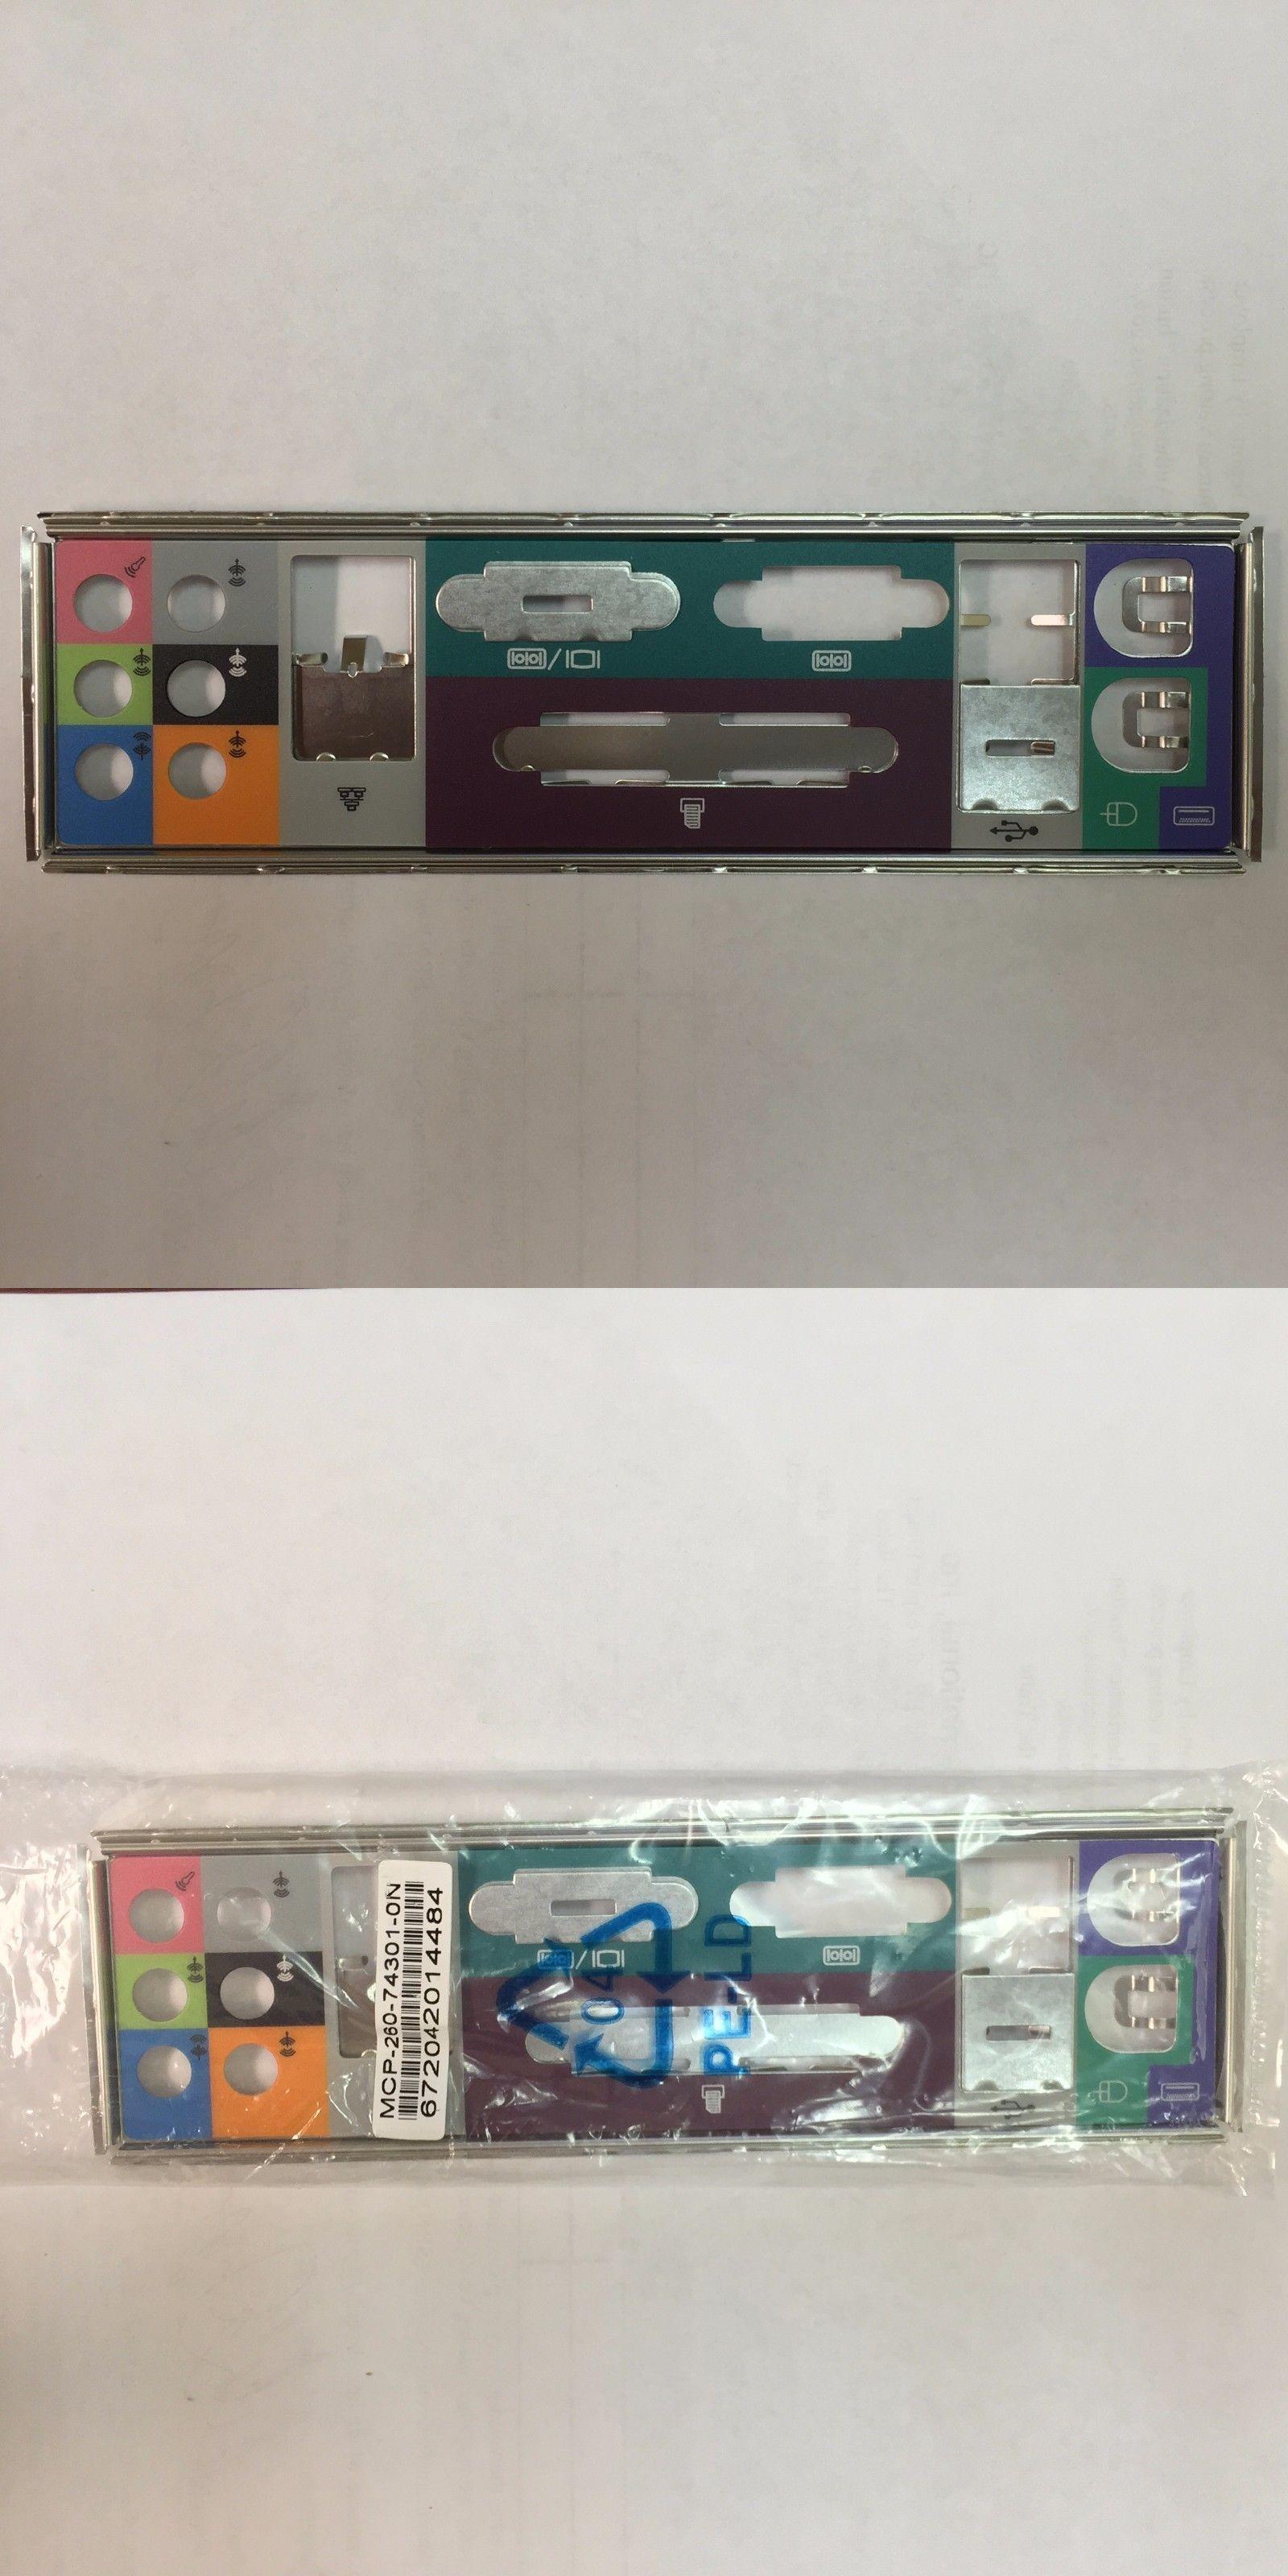 Motherboard Backplates 170080: Supermicro Mcp-260-74301-0N I O